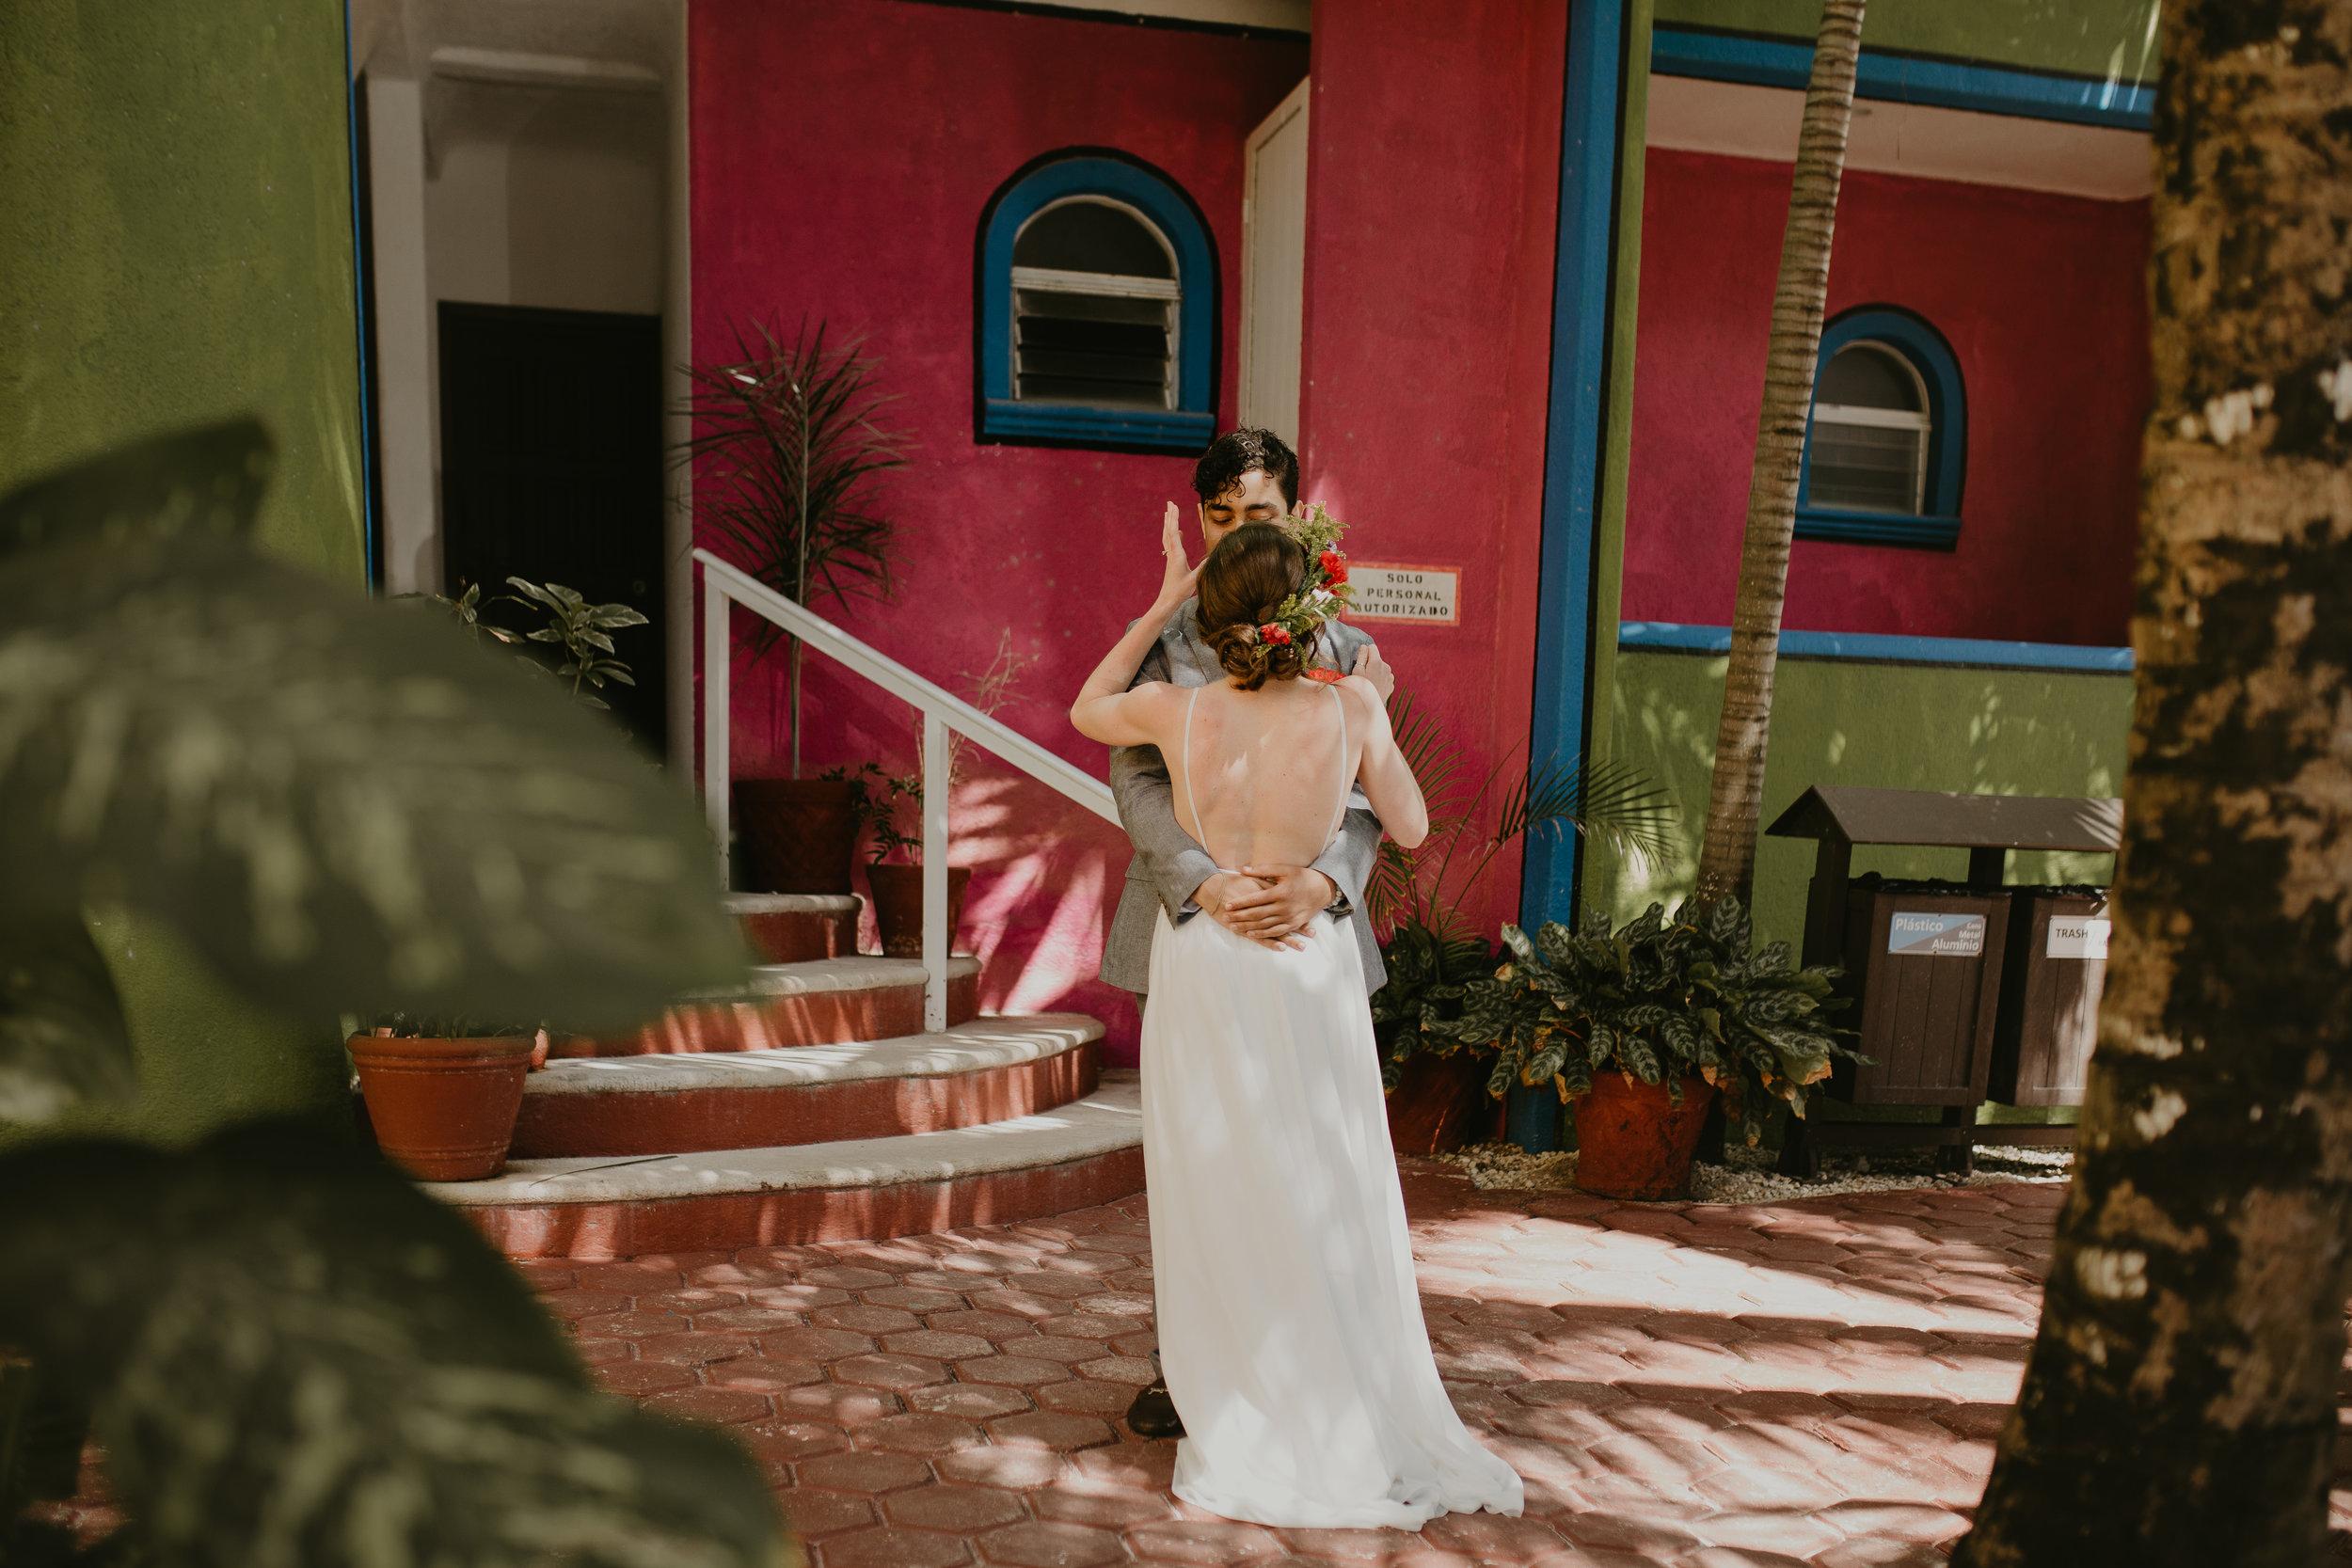 Nicole-Daacke-Photography-beachfront-akumal-destionation-wedding-tulum-mexico-elopement-photographer-destination-wedding-inspiration-sunset-champagne-pop-boho-bride-ocean-tropical-bohemian-tulum-wedding-photos-105.jpg